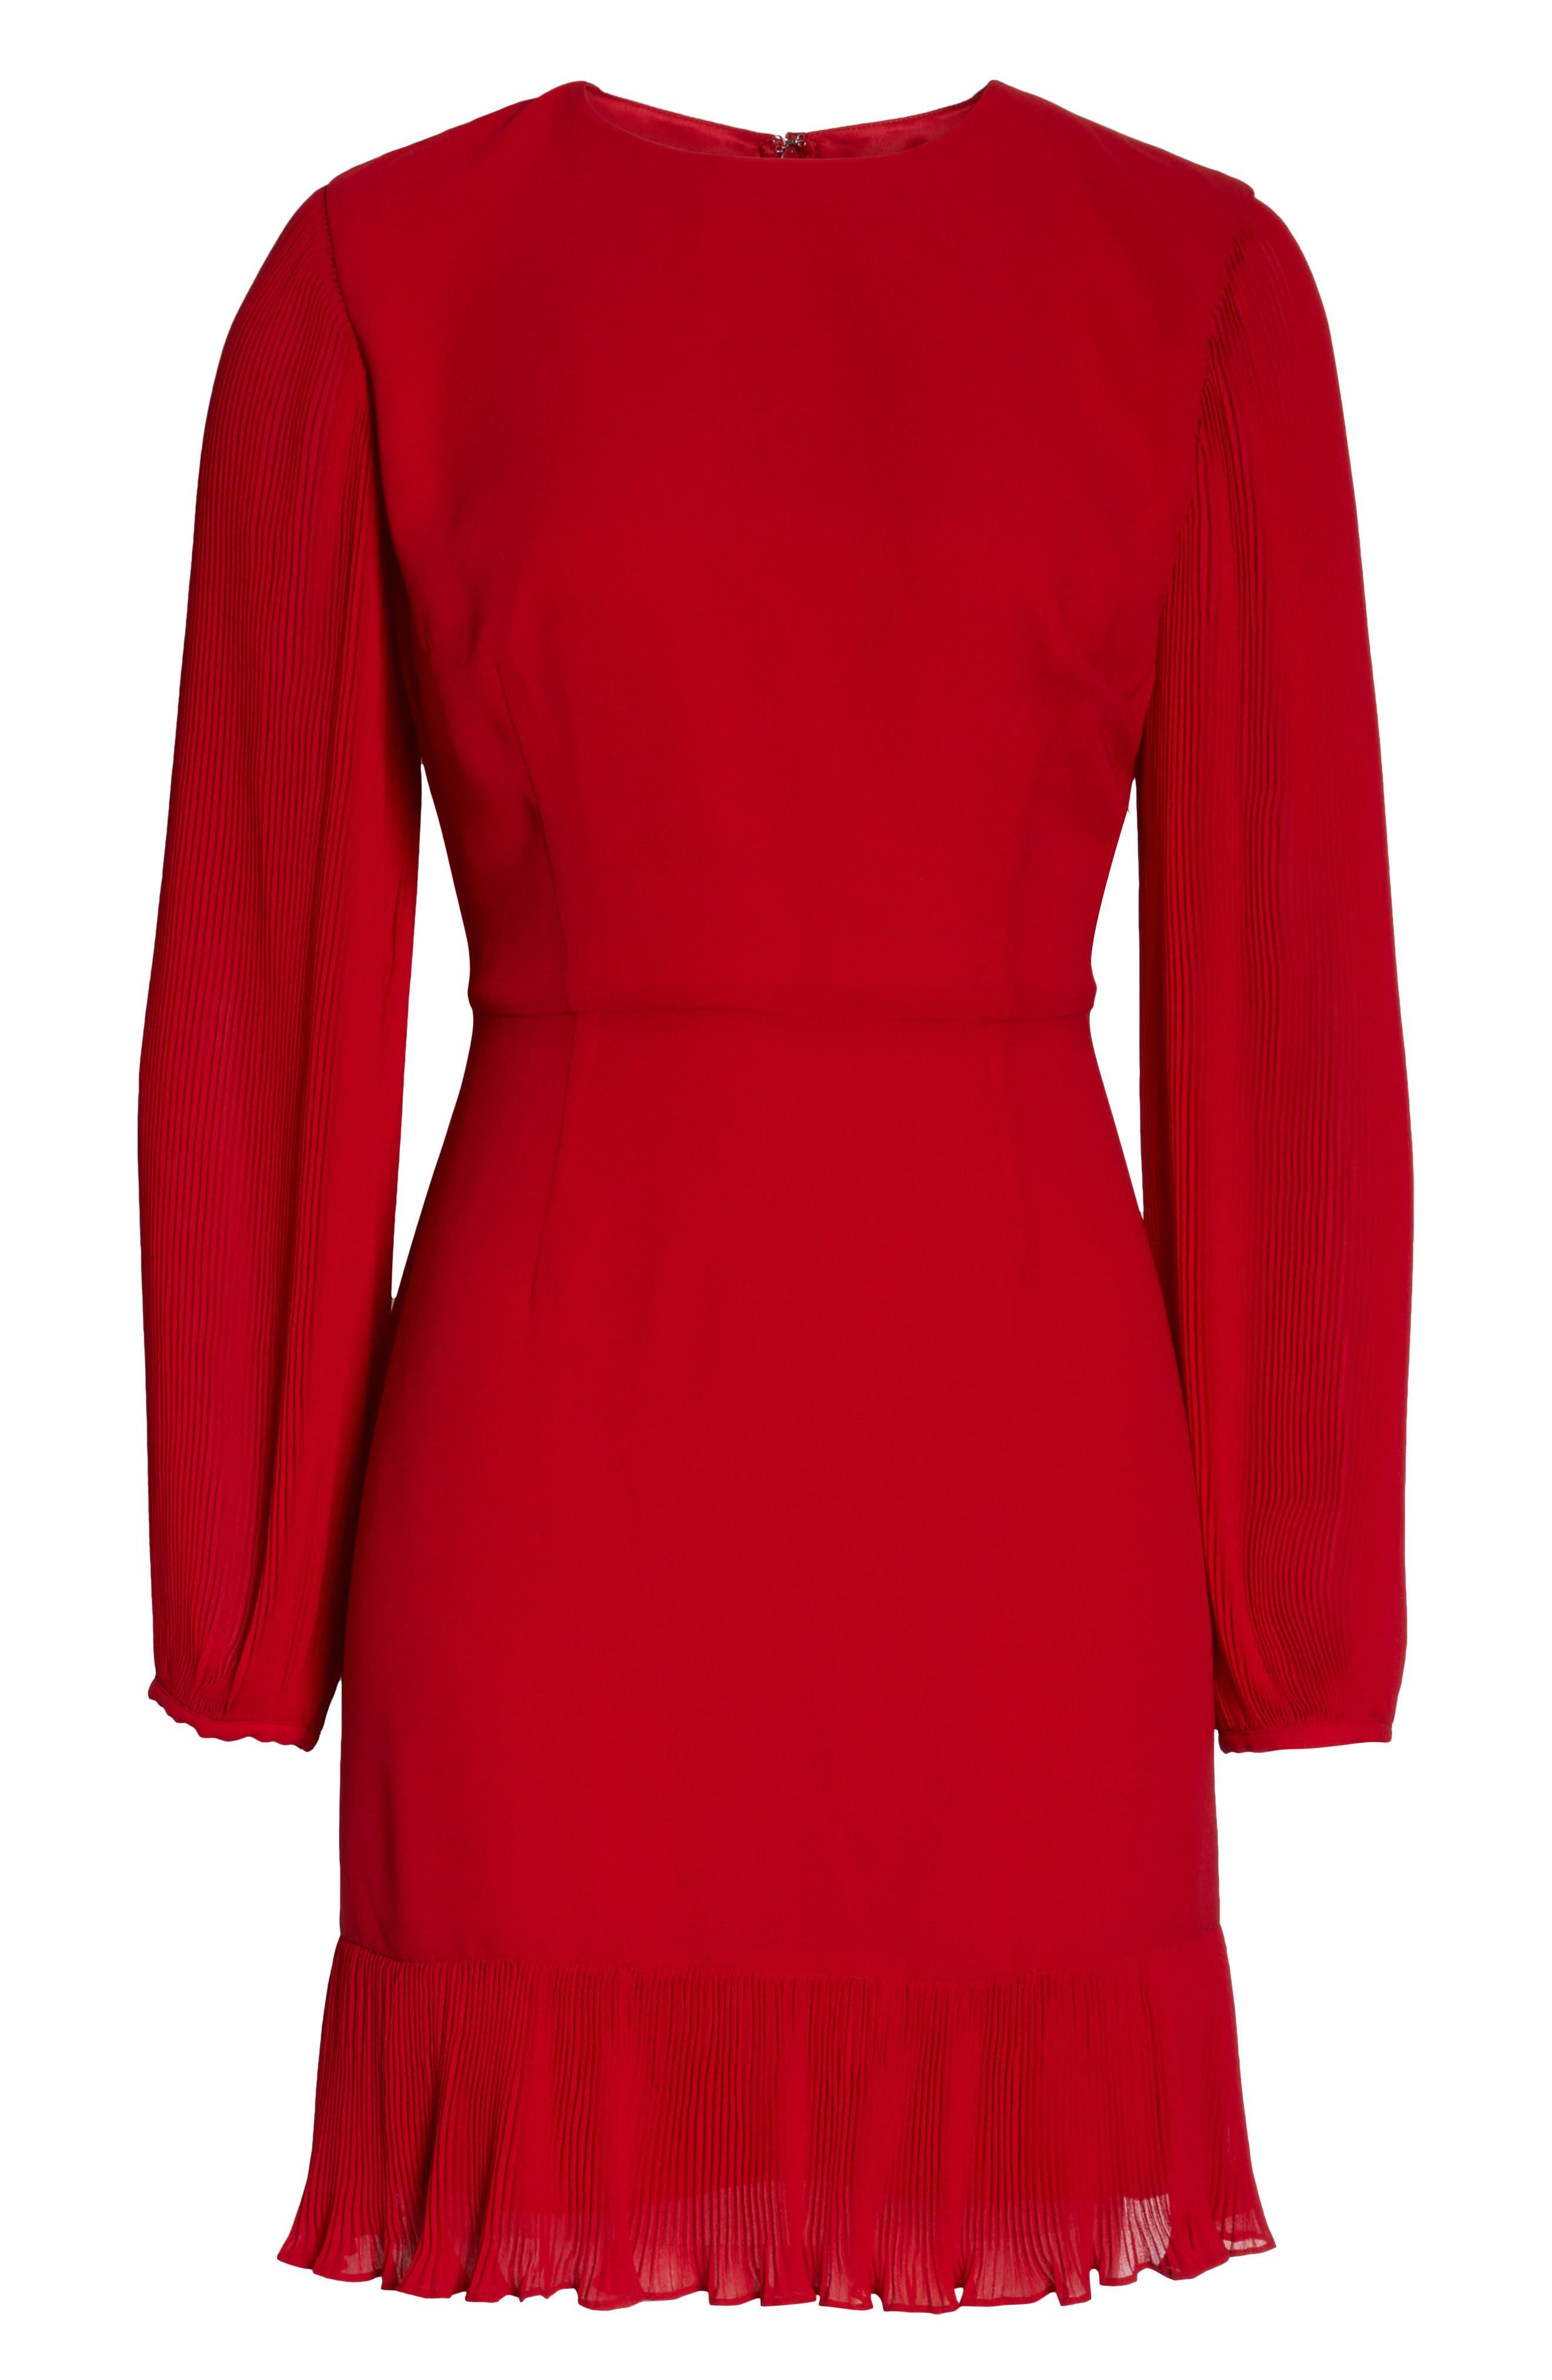 Pleat Sleeve & Ruffle Hem Dress,                             Alternate thumbnail 7, color,                             RED JESTER